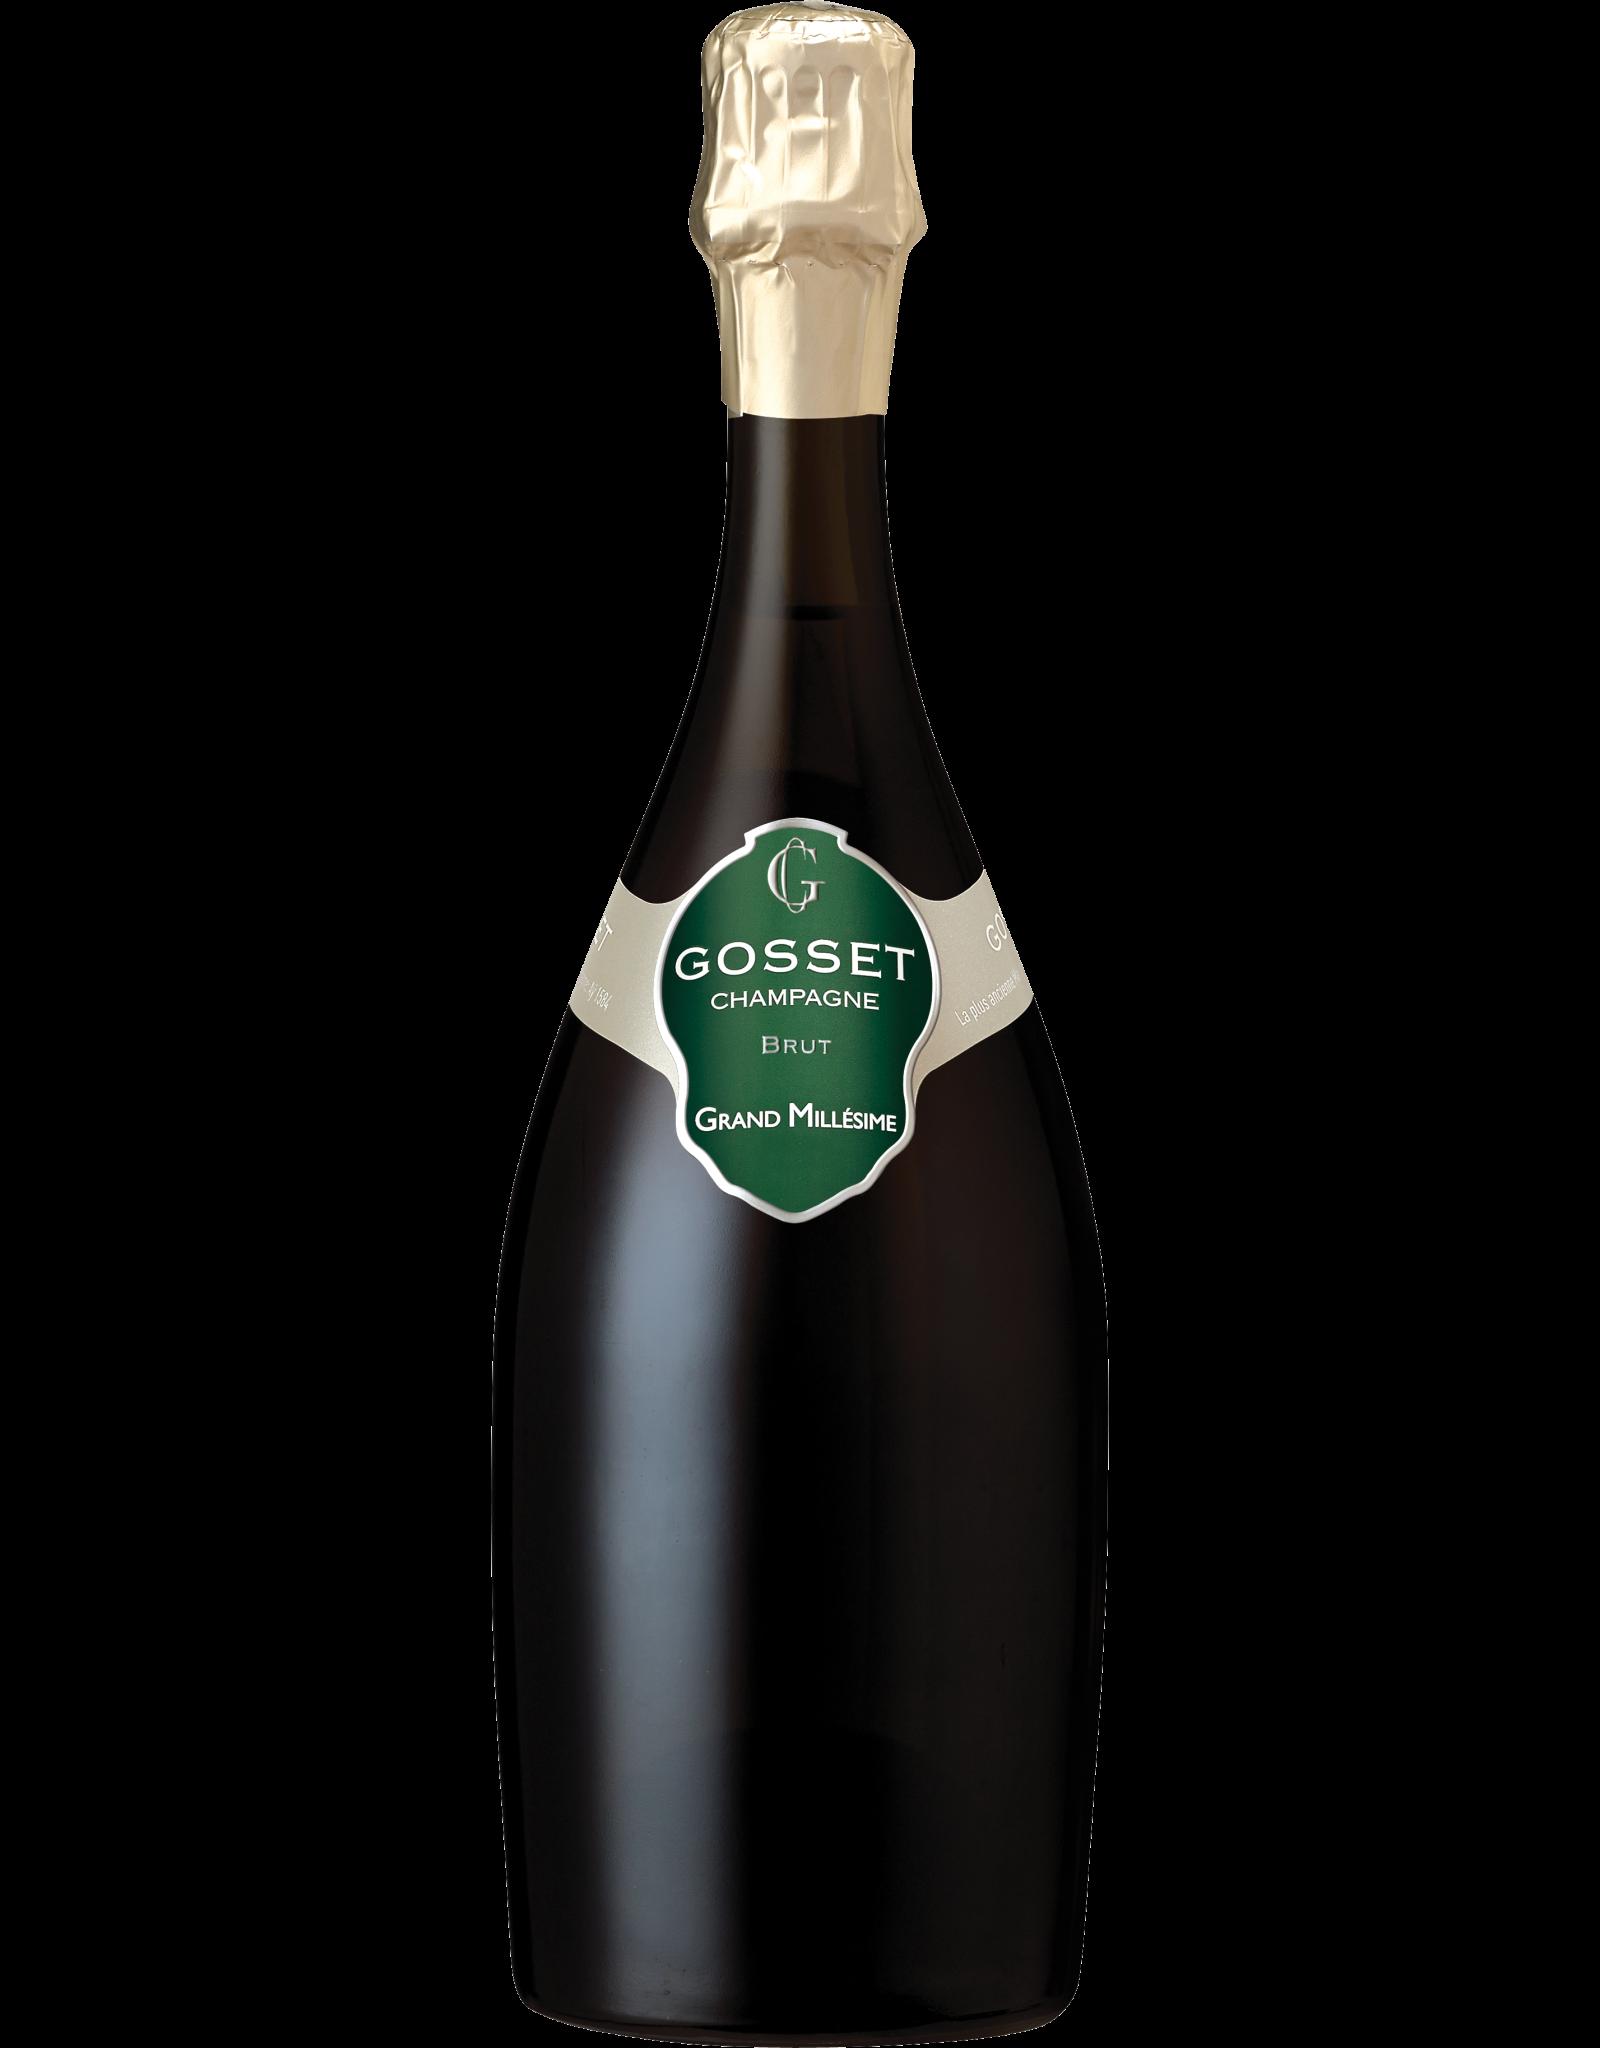 Gosset Champagne Brut Grand Millesime 2006